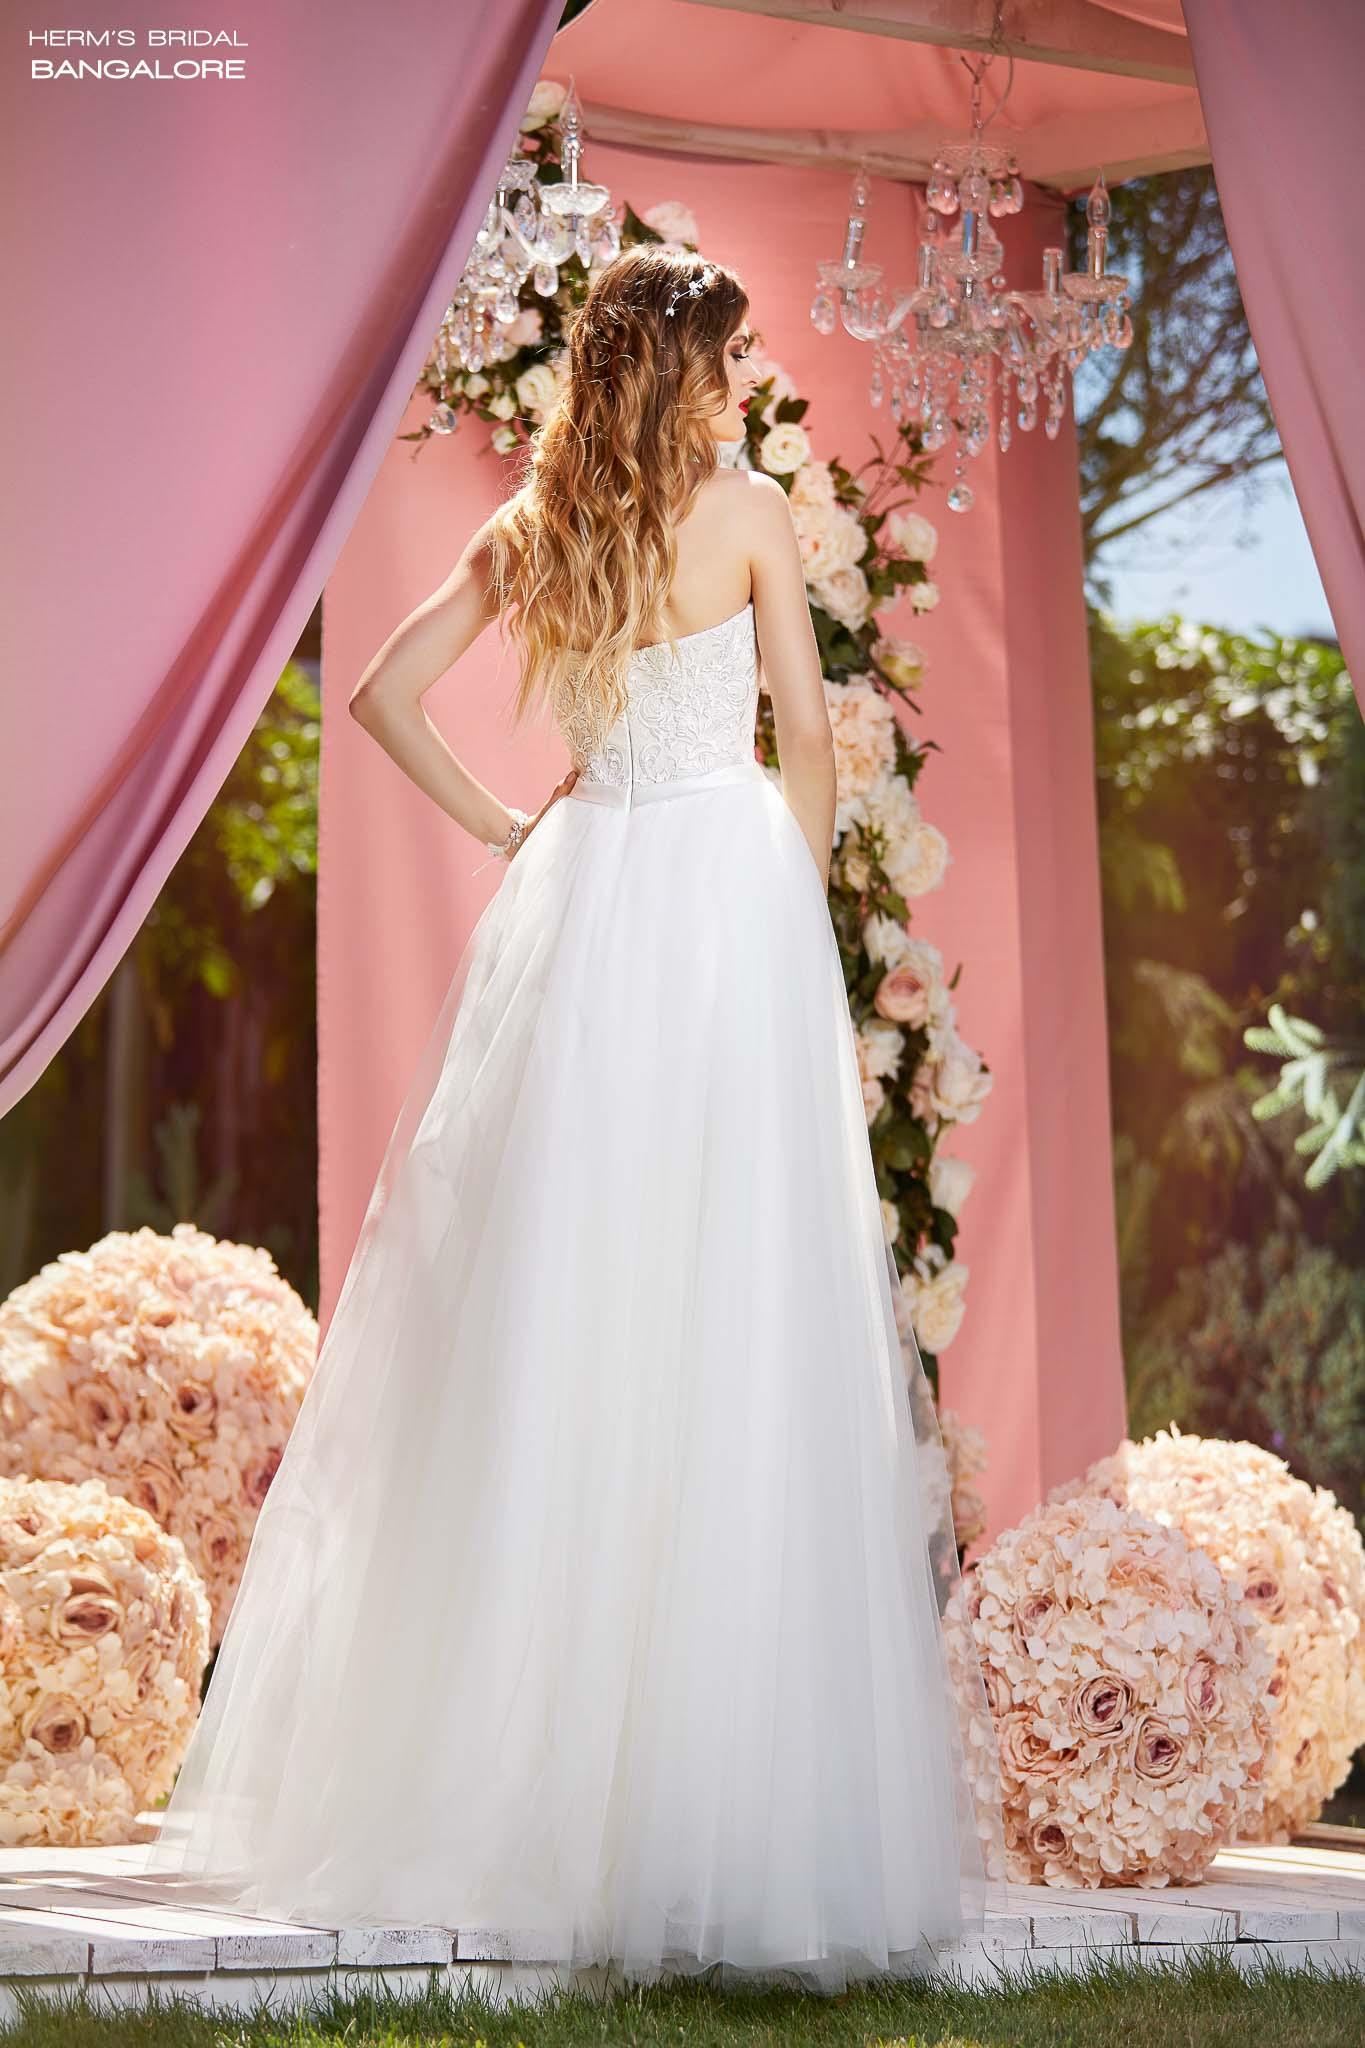 suknia ślubna Herm's Bridal Bangalore